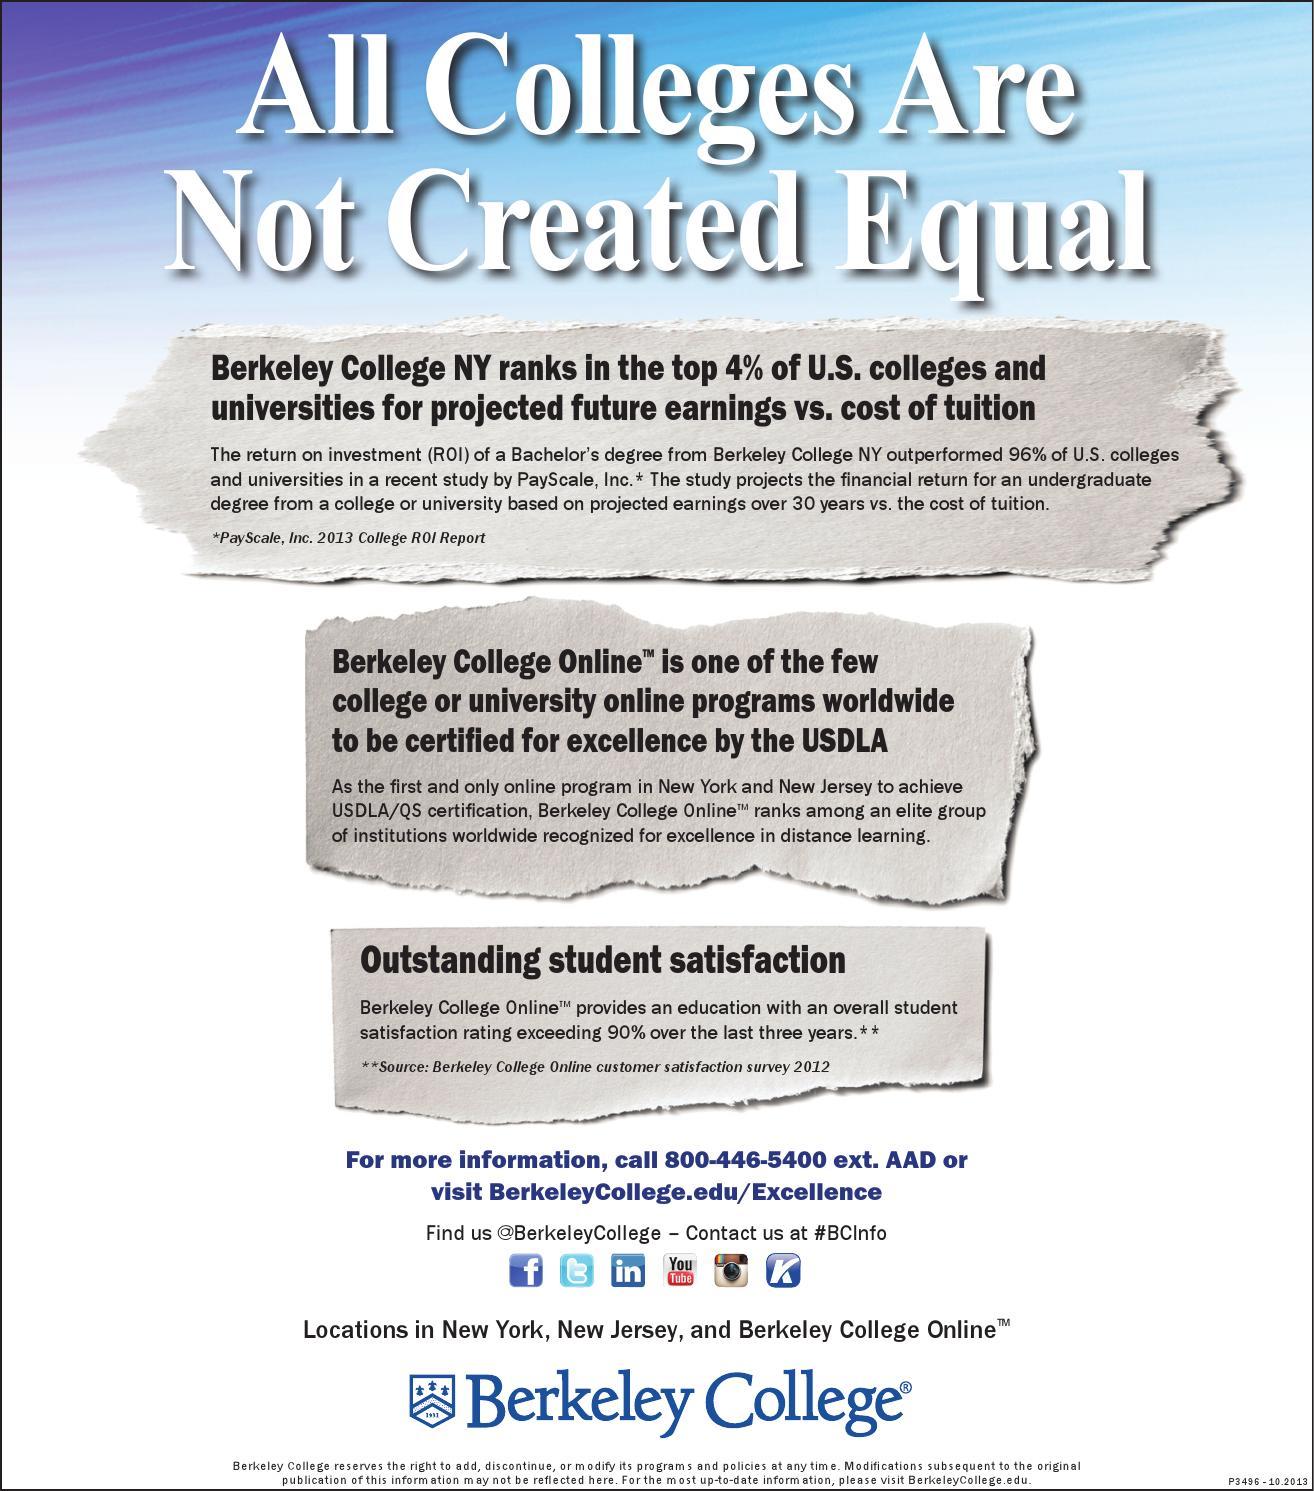 Berkeley college online e folder by berkeley college issuu aiddatafo Choice Image